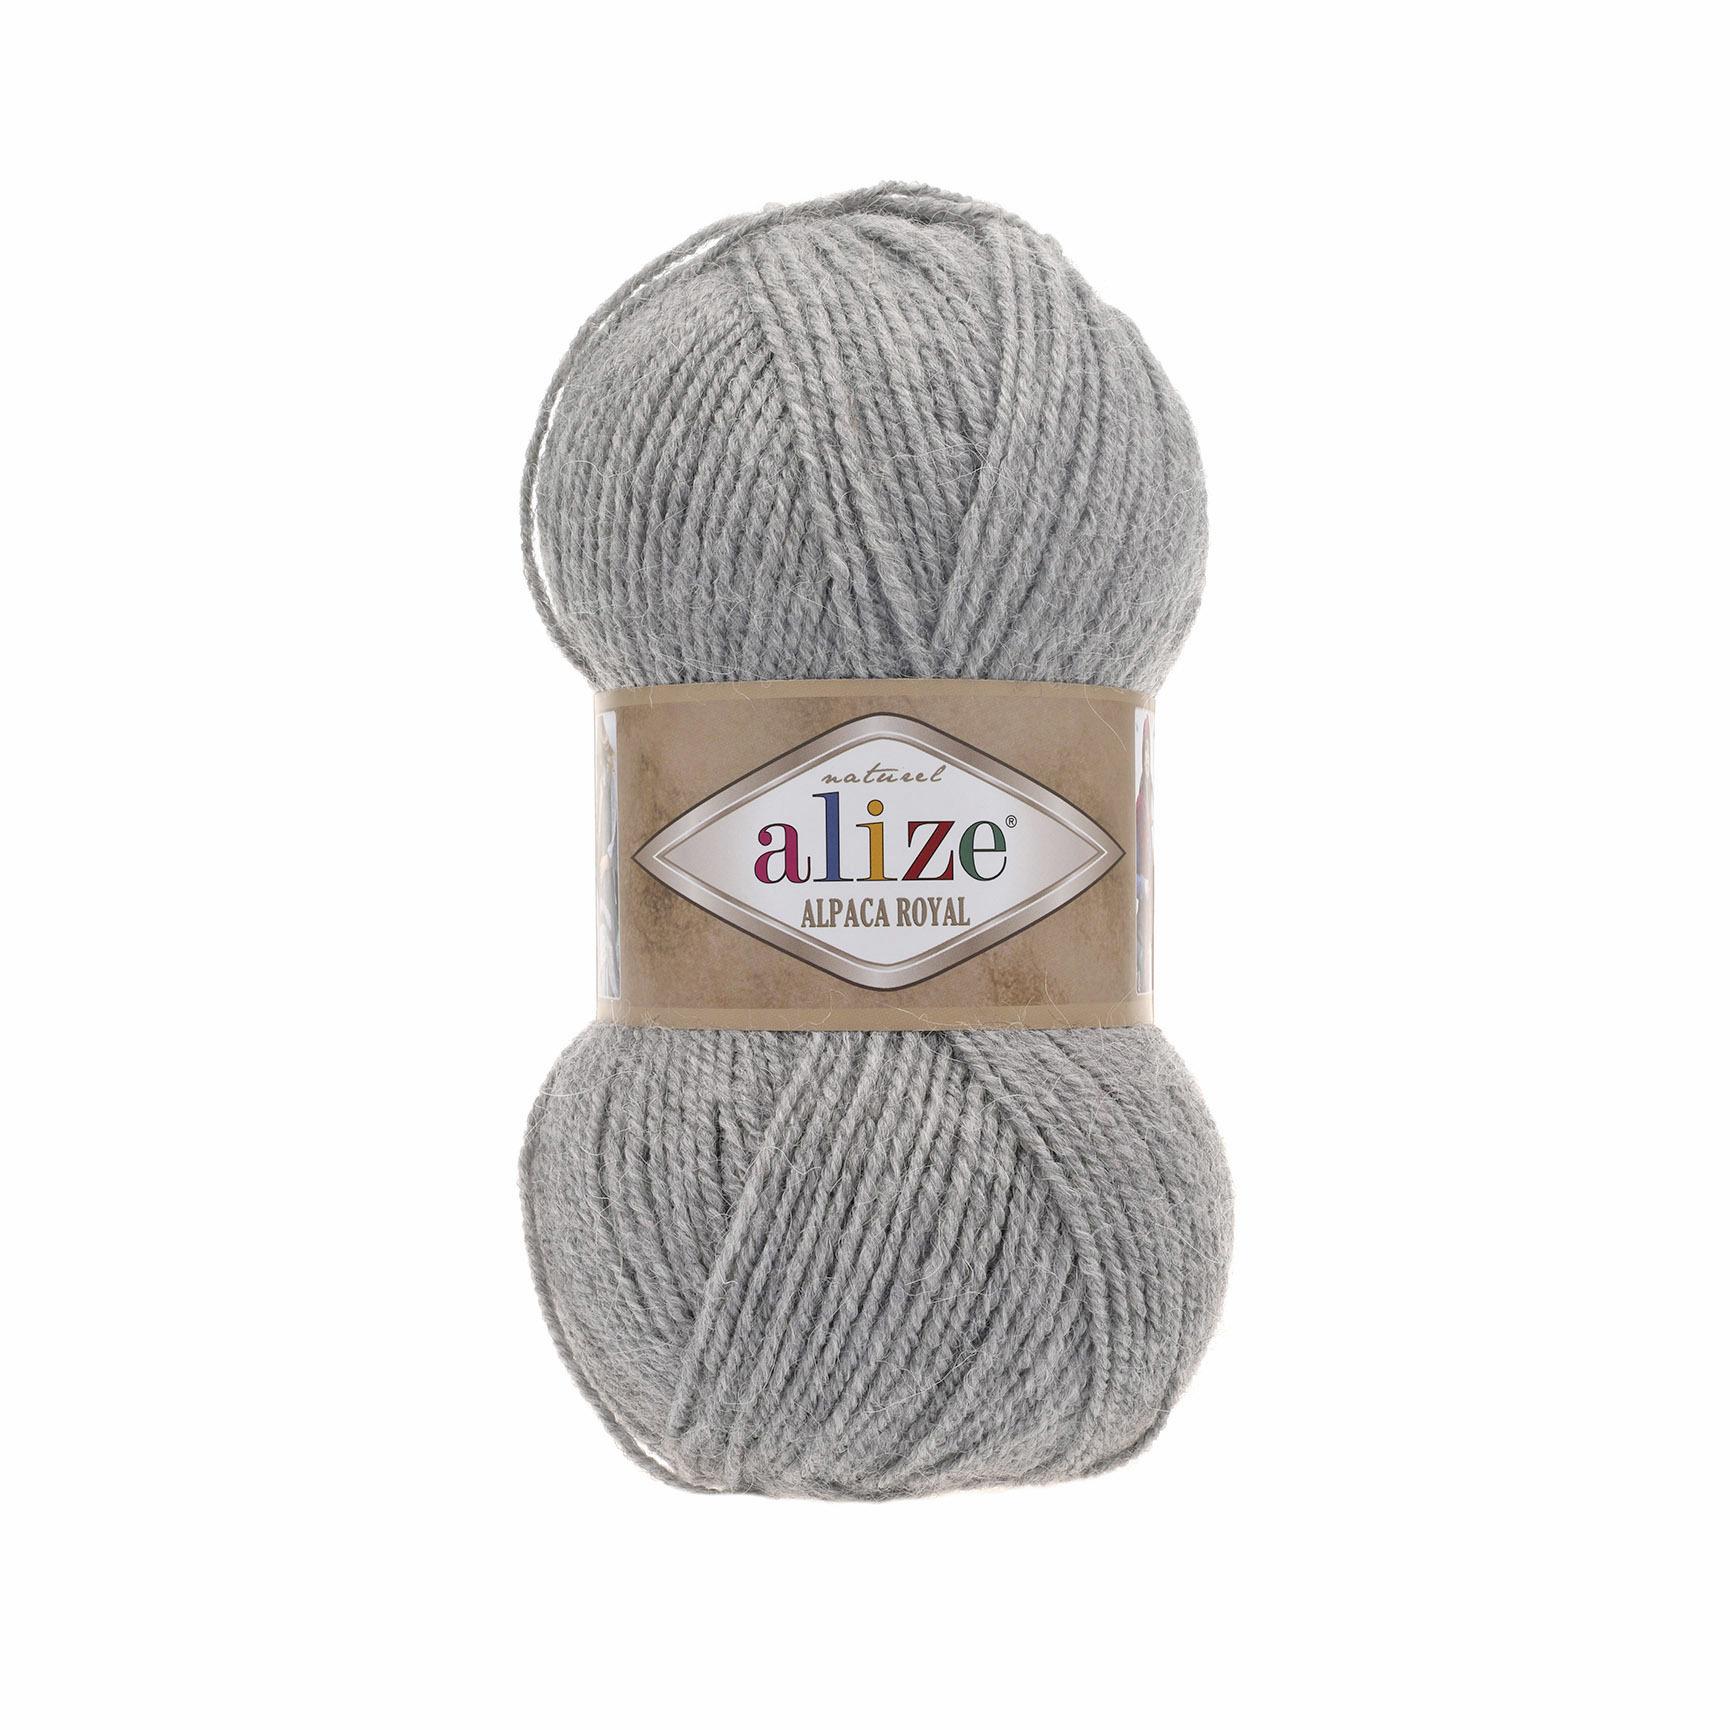 Пряжа Alize Alpaca Royal серый 21